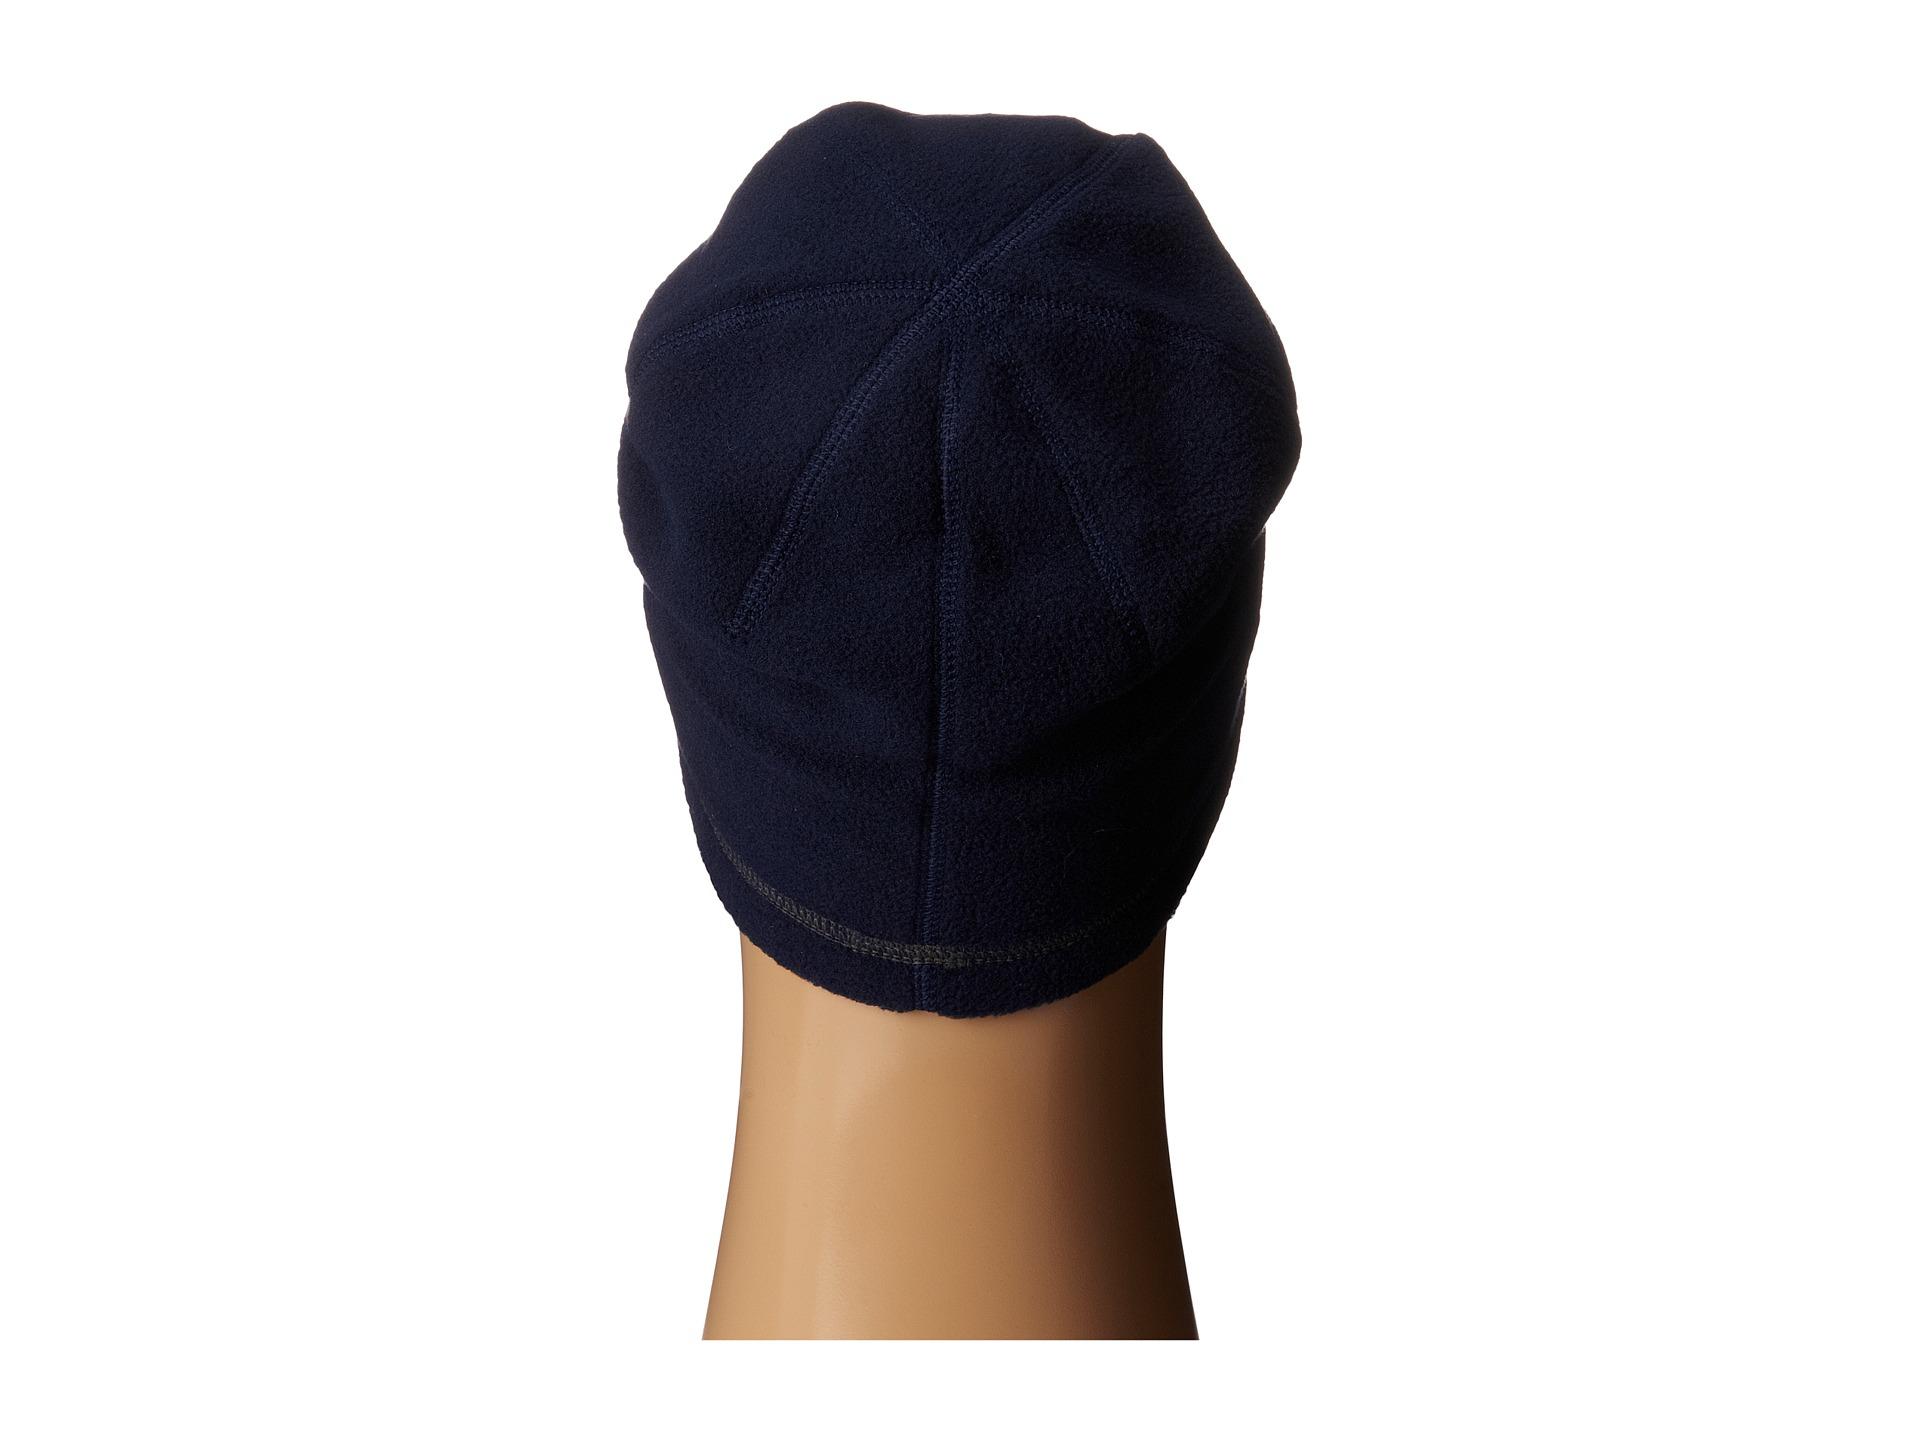 c220b748add4a Lyst - Sperry Top-Sider Fleece Beanie in Blue for Men